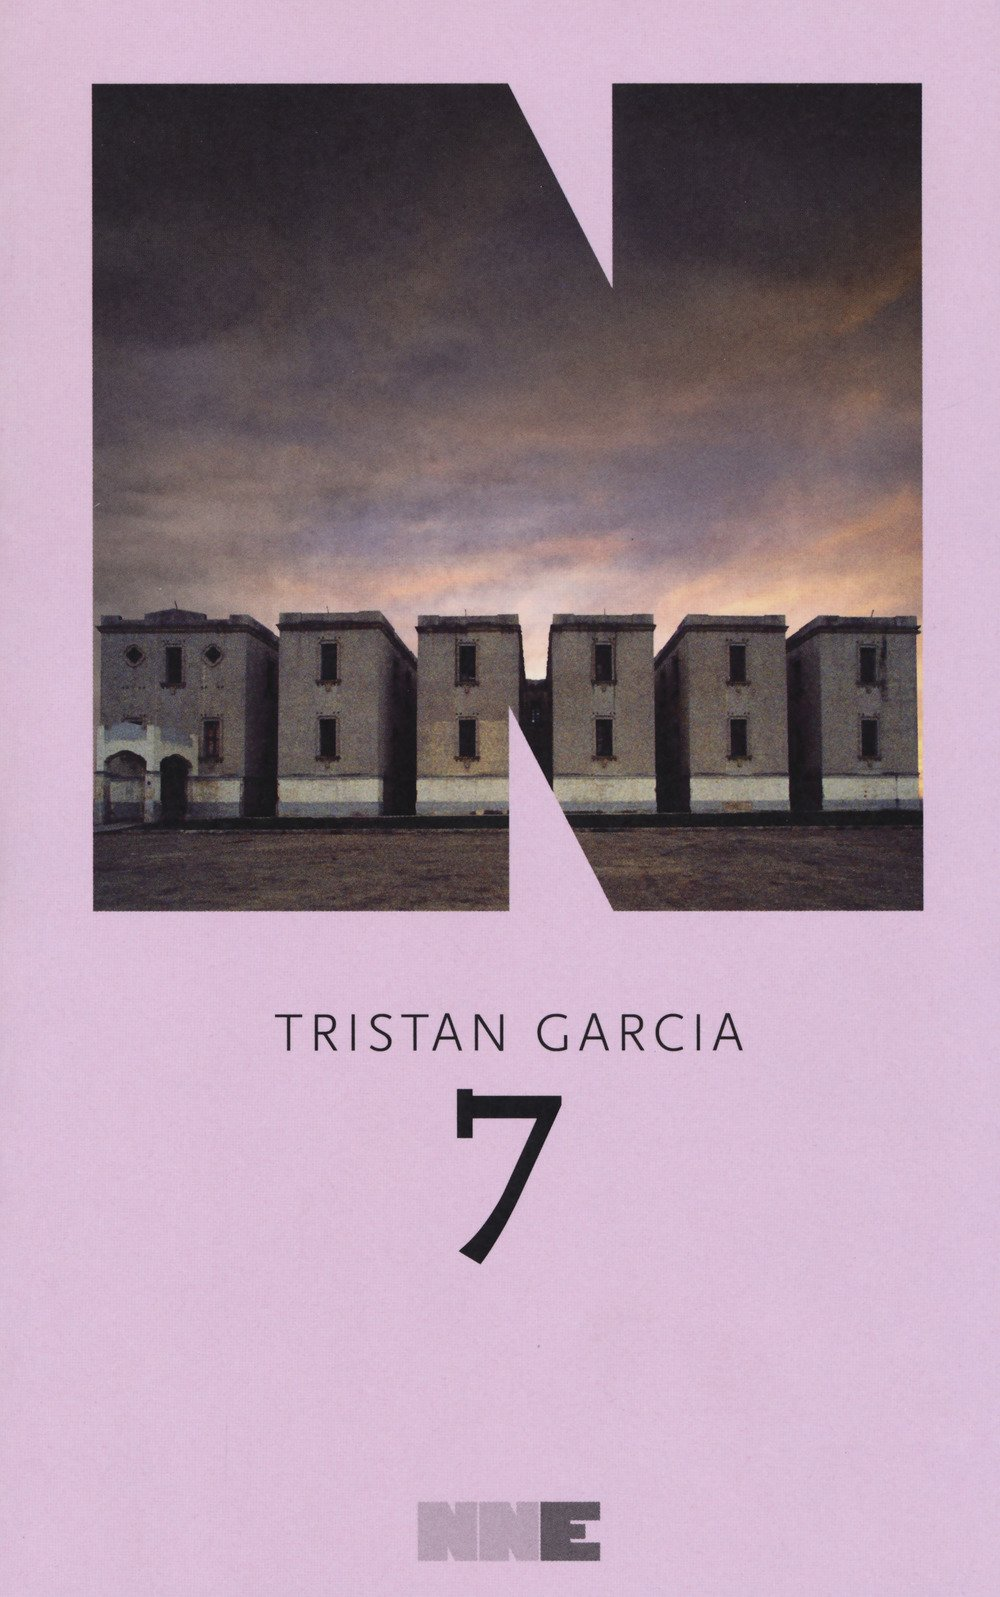 Tristan Garcia – 7